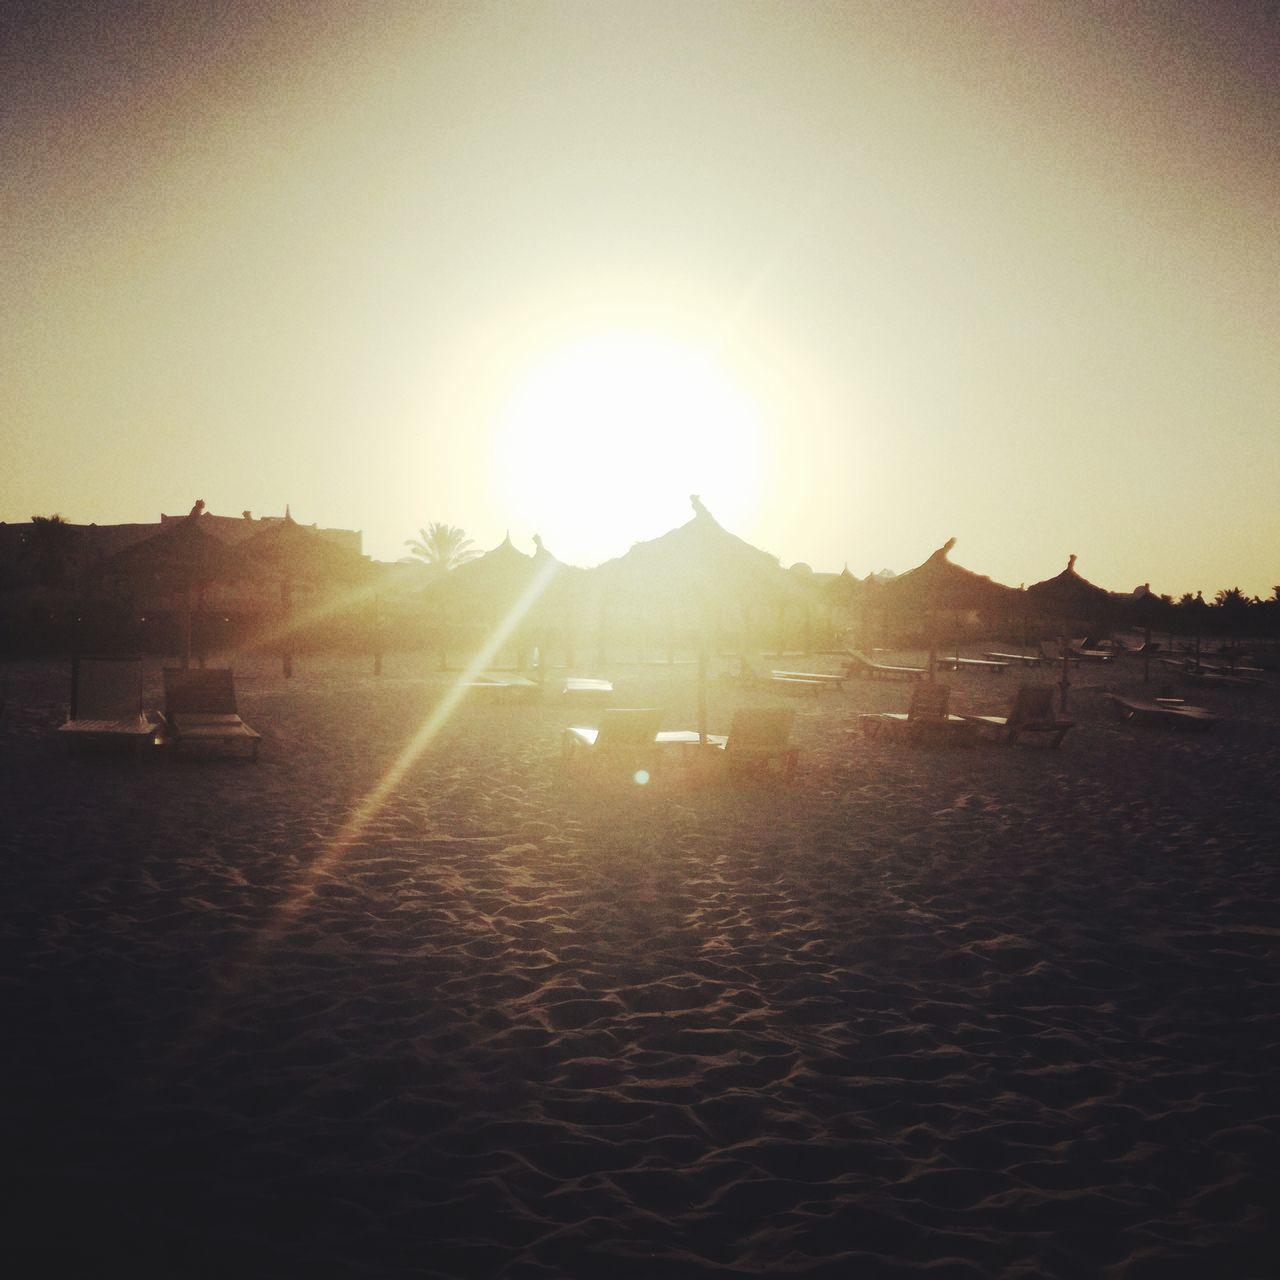 SCENIC VIEW OF BEACH AGAINST BRIGHT SUN